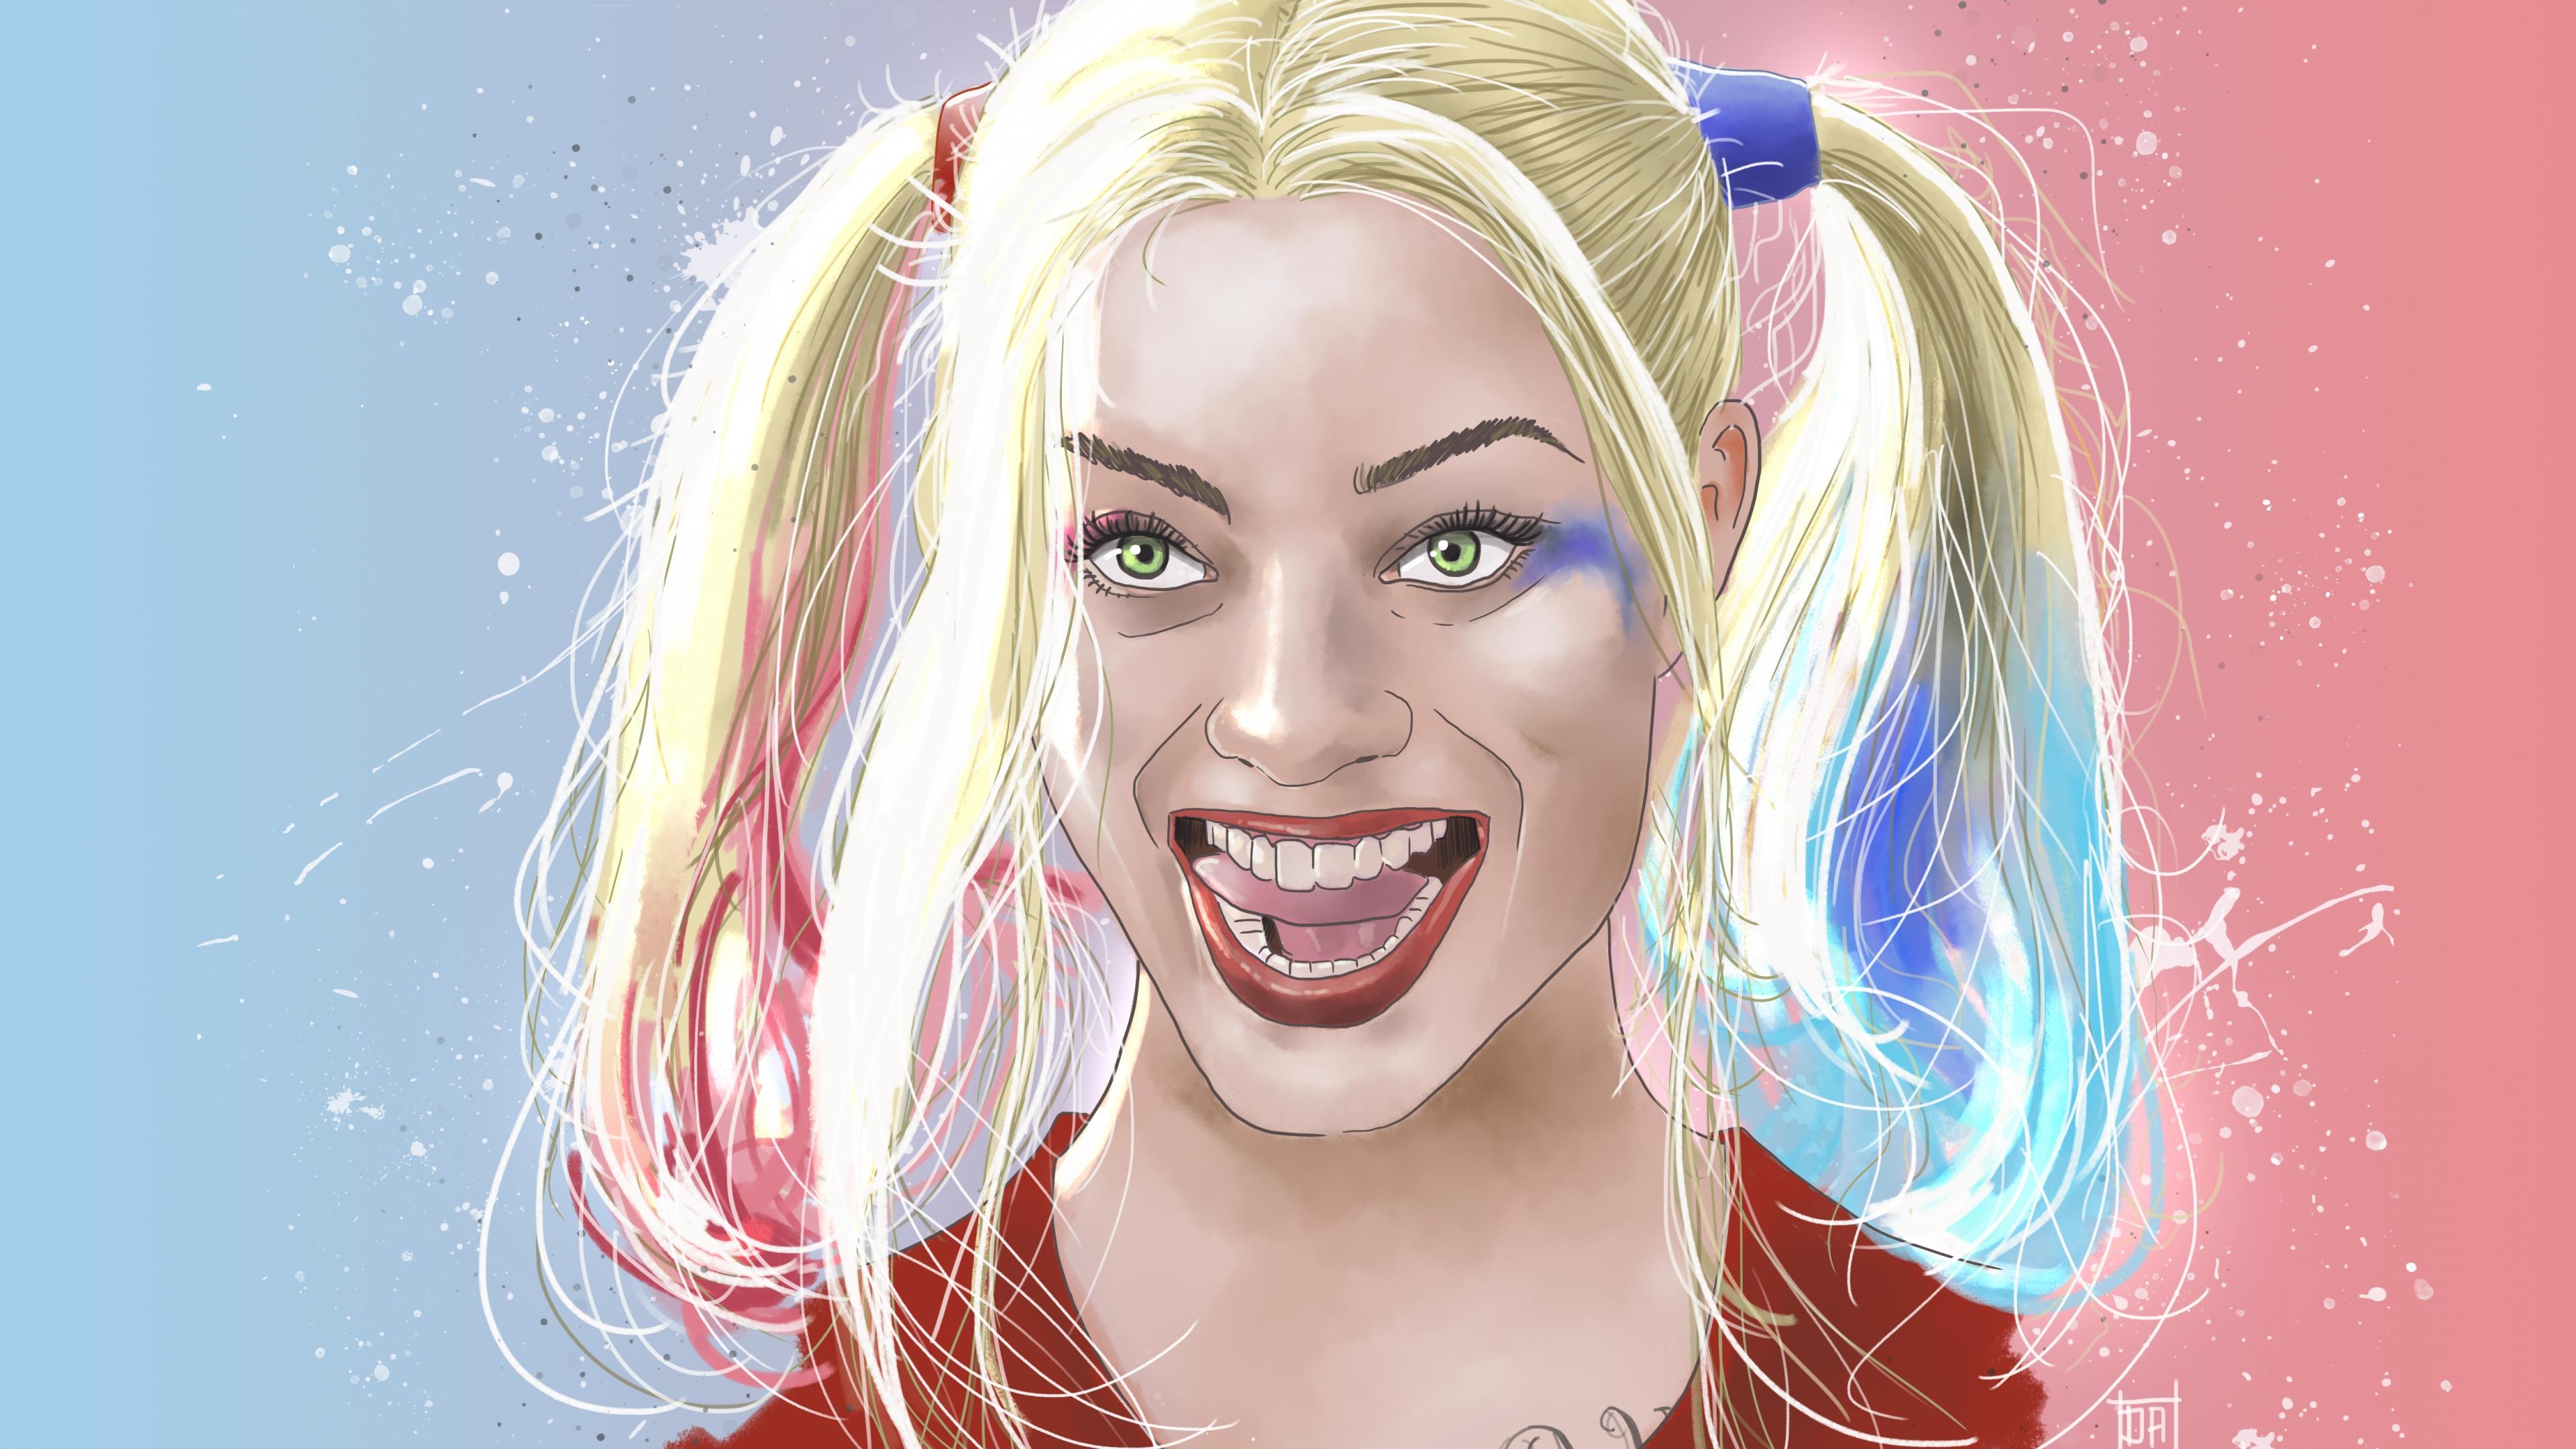 Harley Quinn Artwork Wallpaper Id 5733